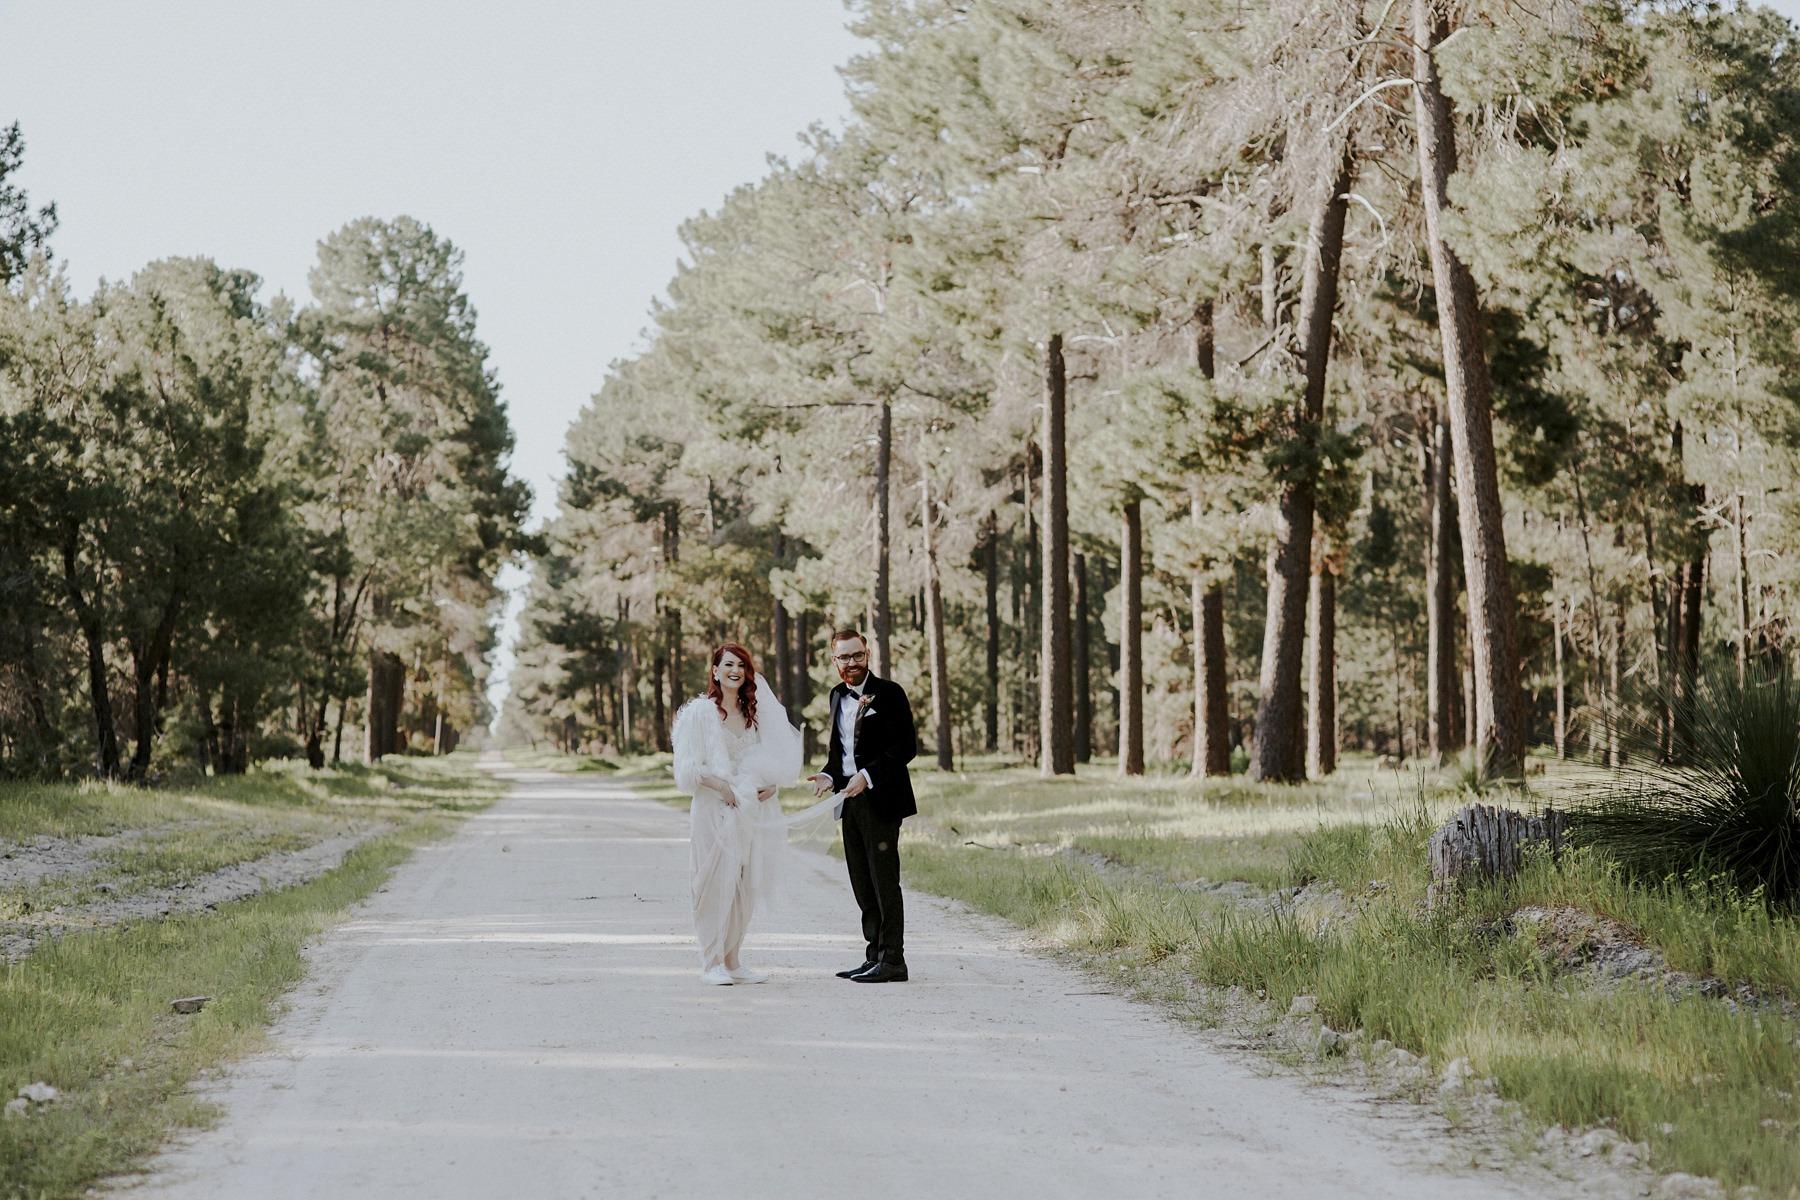 flour-factory-wedding_perth-city-wedding-098